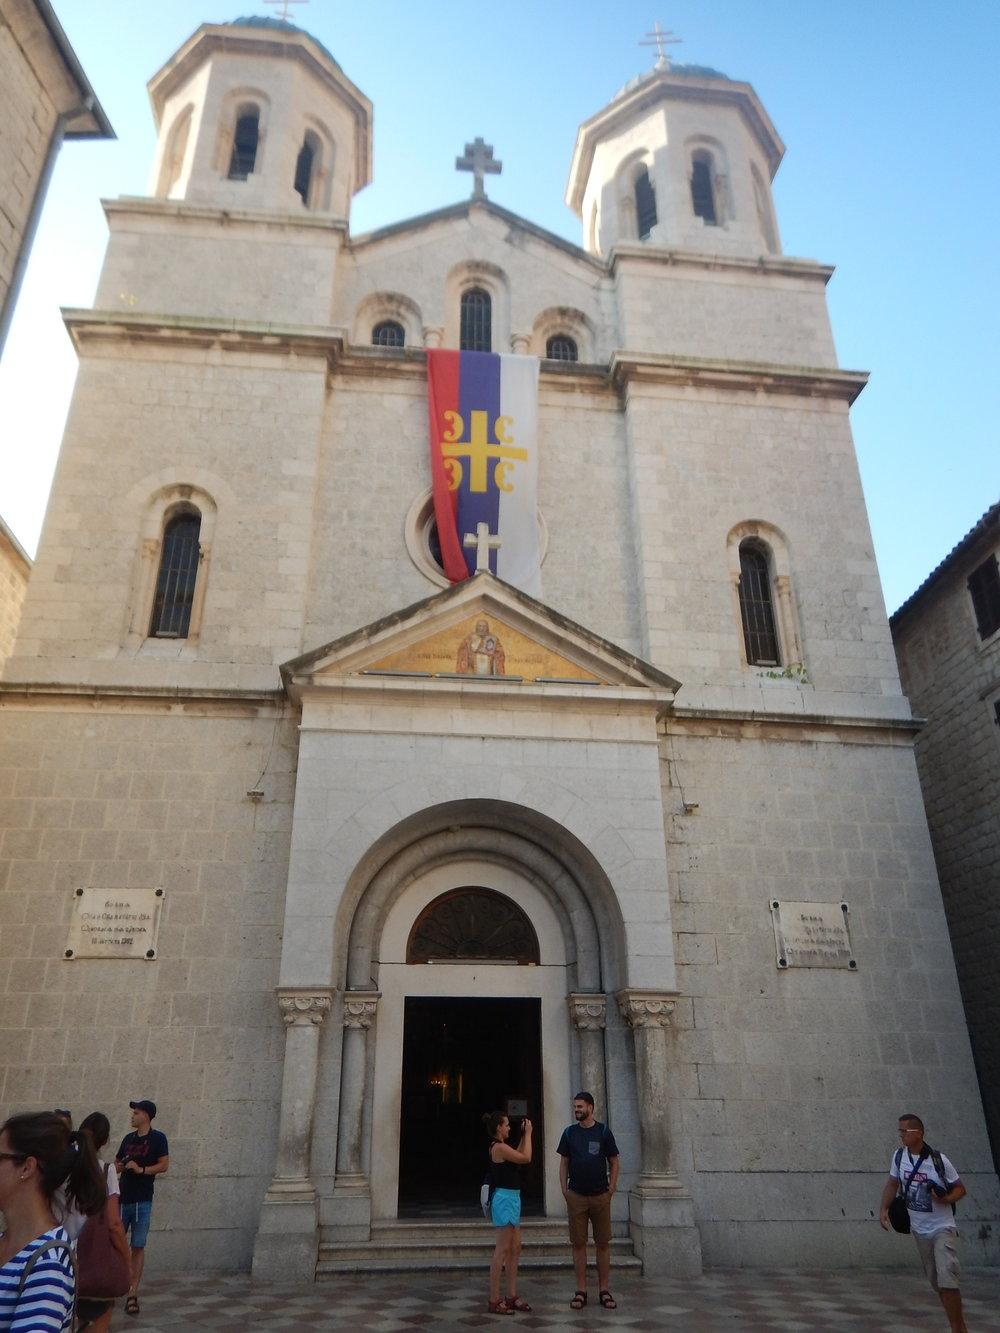 St Nicholas Church in Kotor, Montenegro